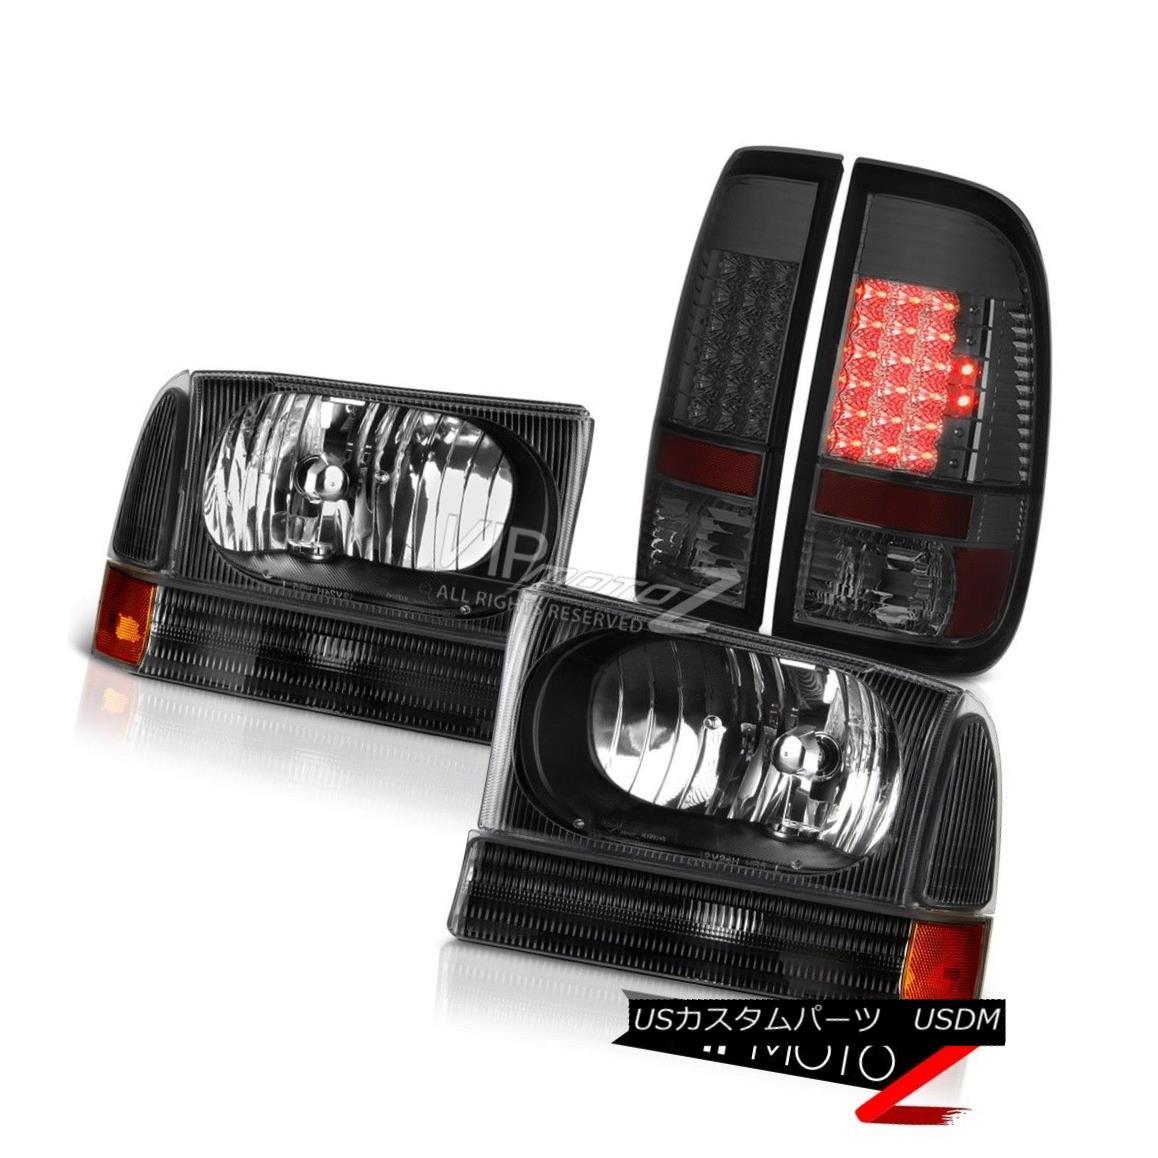 03-06 Silverado Red /& Smoked Factory Style Rear Tail Lights Brake Lamps Pair Set